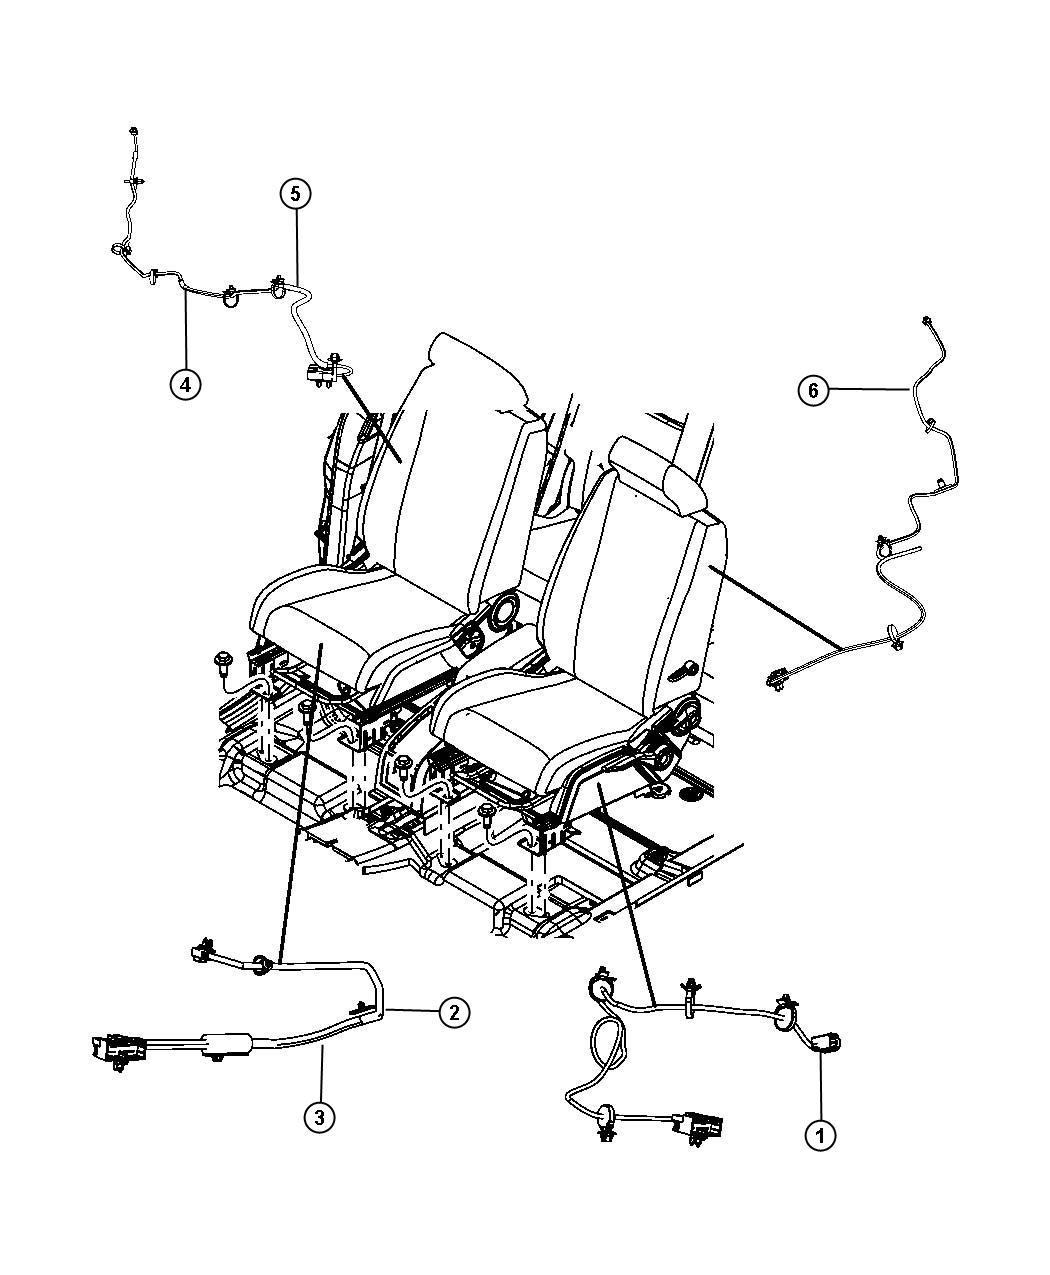 Dodge Journey Wiring Power Seat Seat Trim Prem Cloth